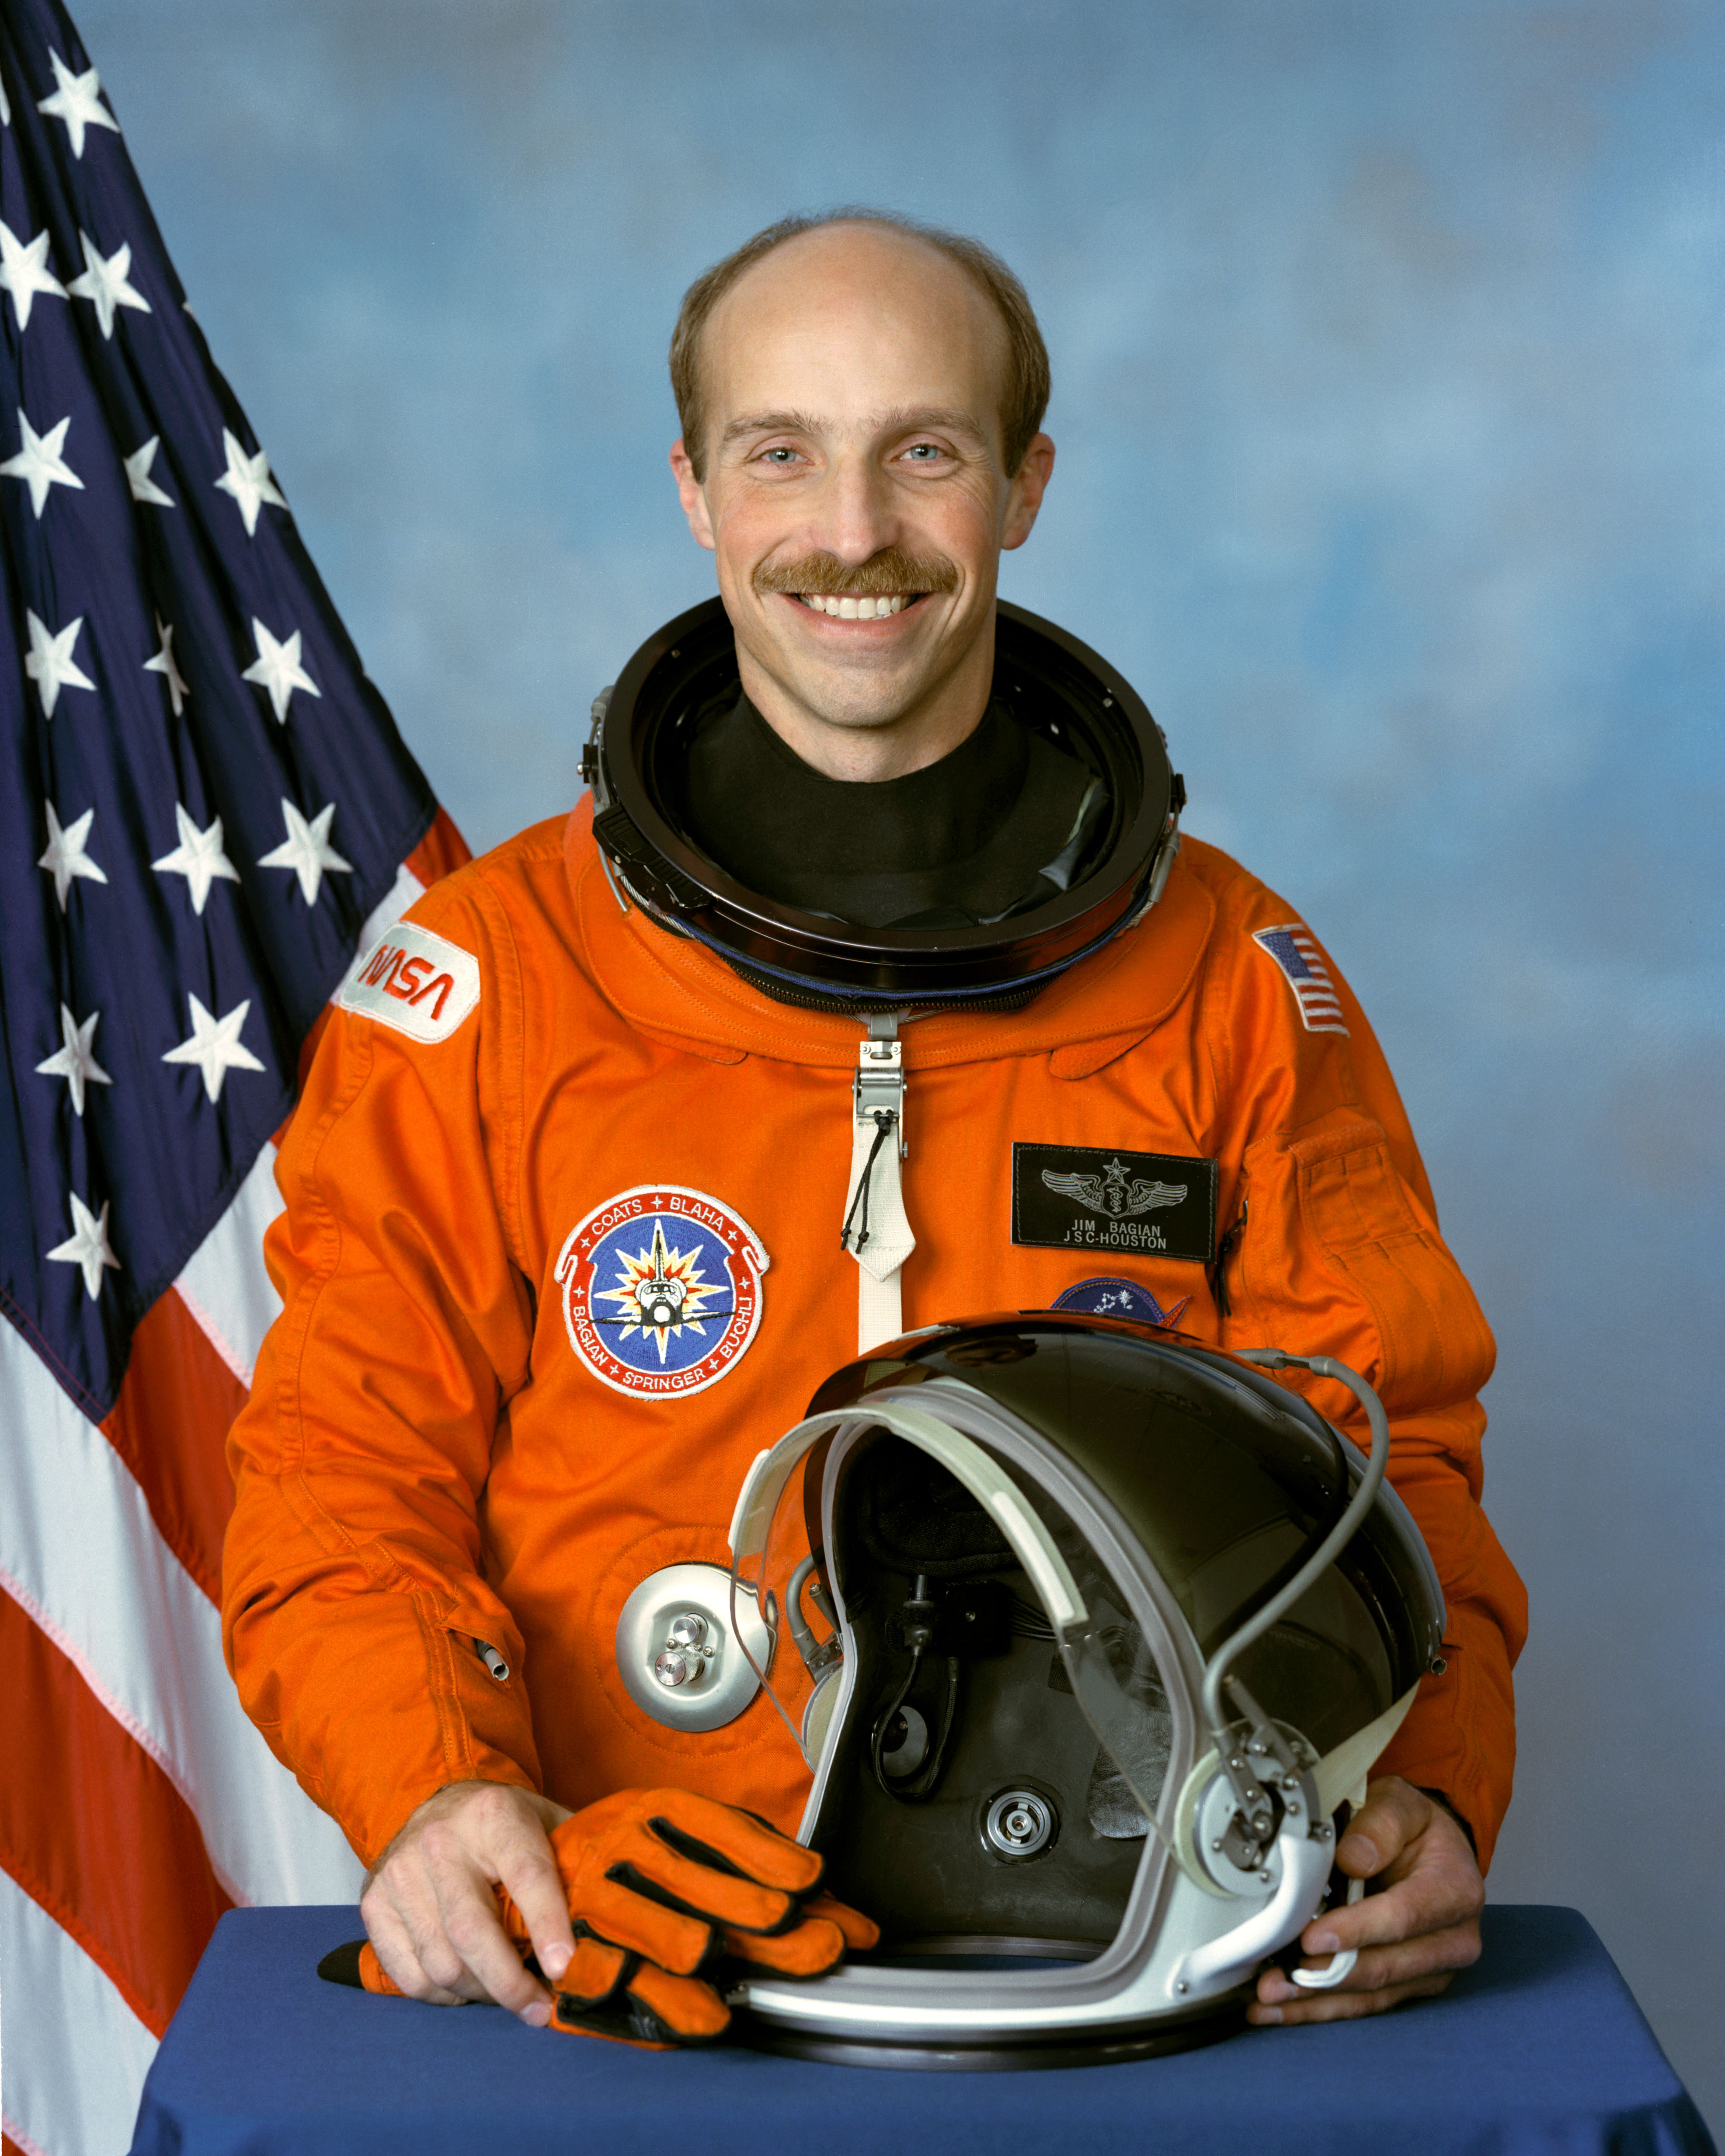 Astronaut Dr. James Bagian, NASA photo Source: Wikipedia (www.jsc.nasa.gov unavailable February 2020) James_Philipp_Bagian.jpg